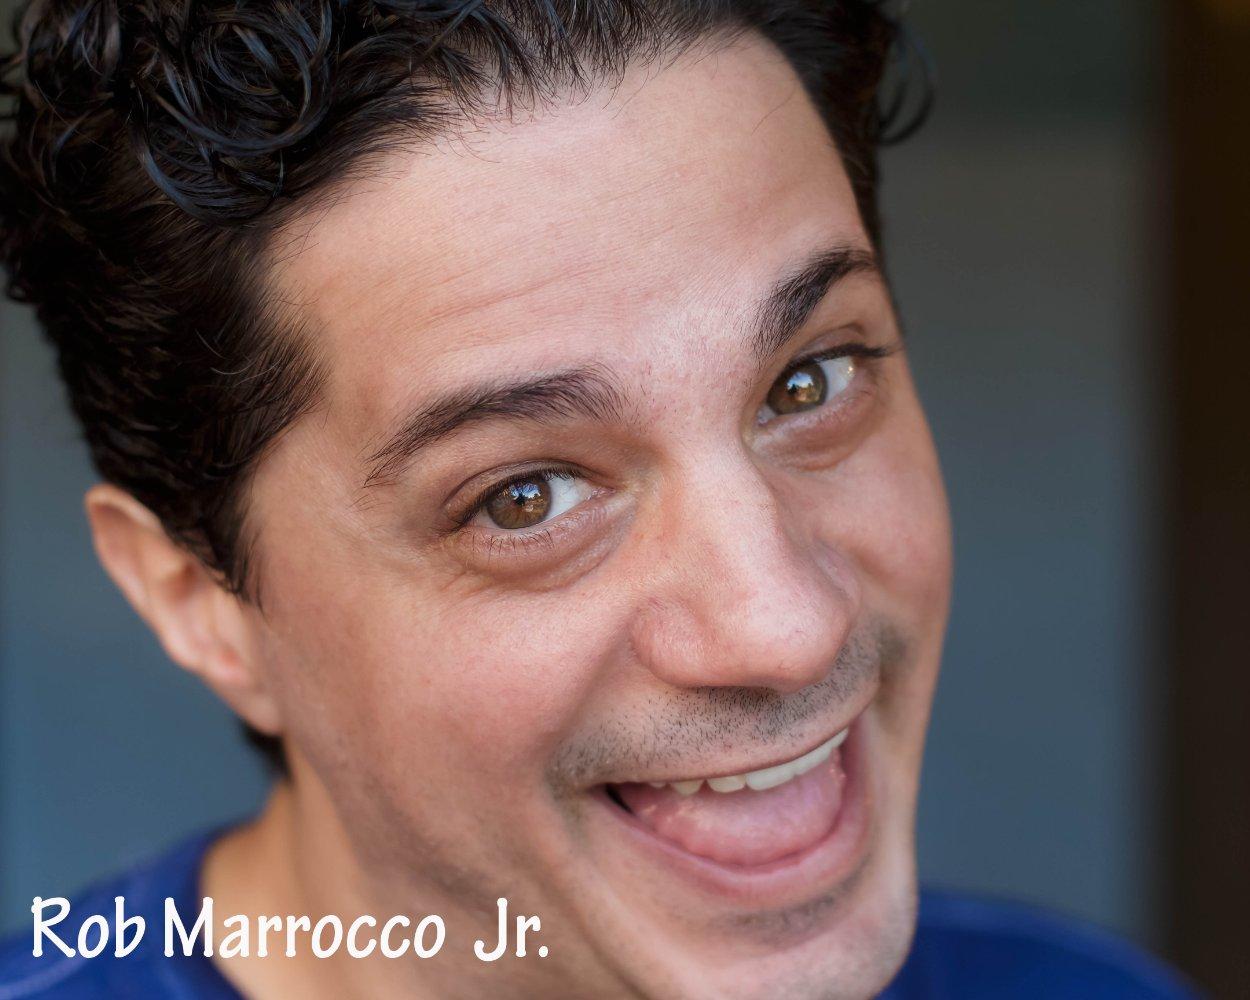 Rob Marrocco Jr.